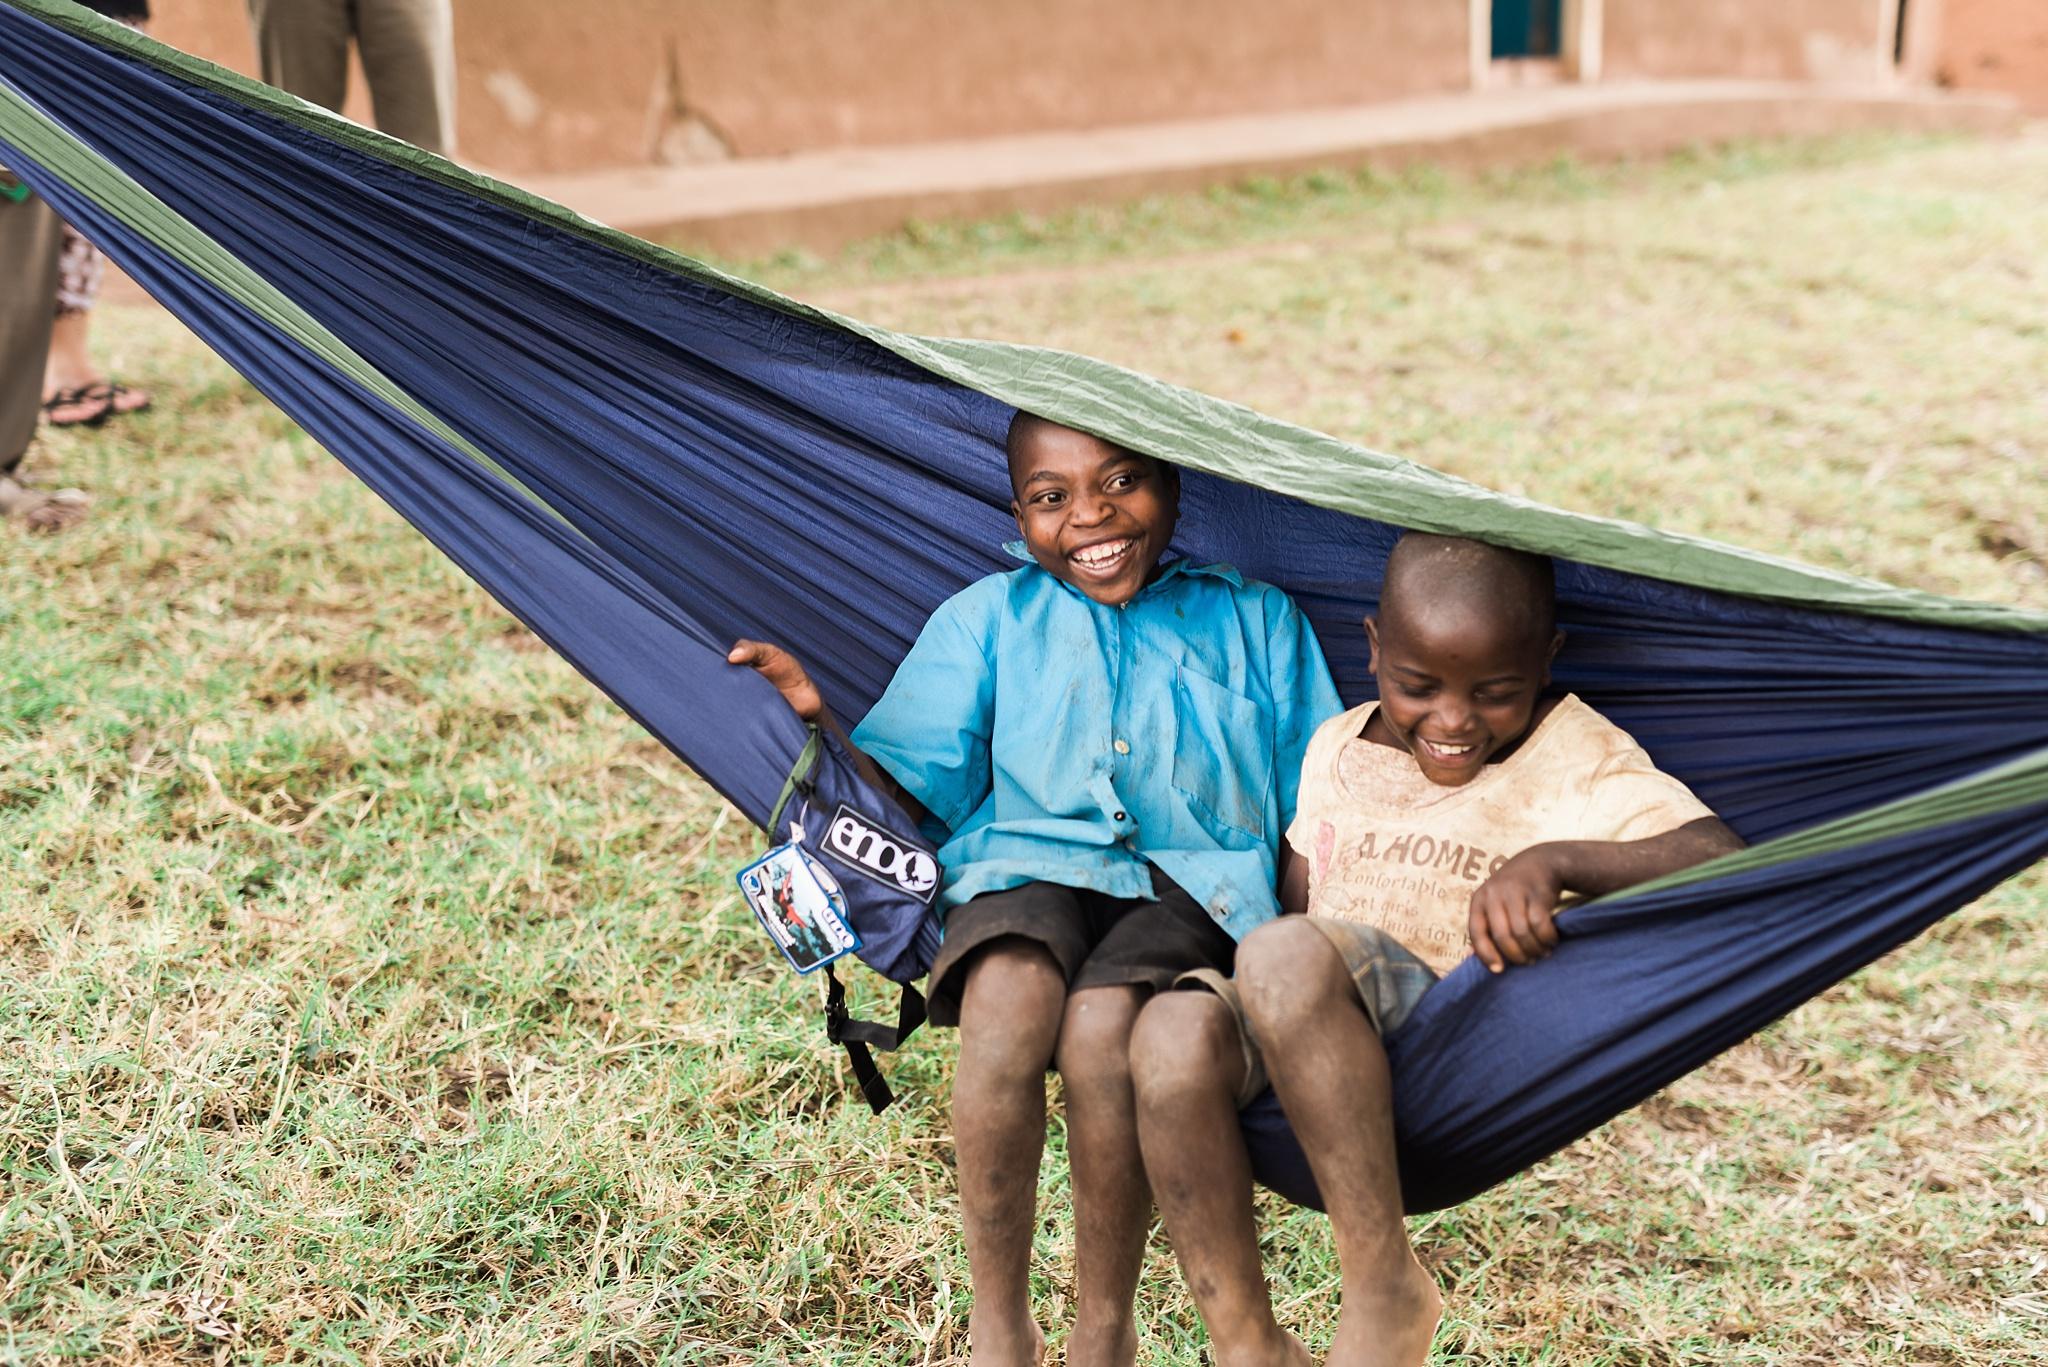 destination-photographer-uganda-graceforeducation-132.jpg